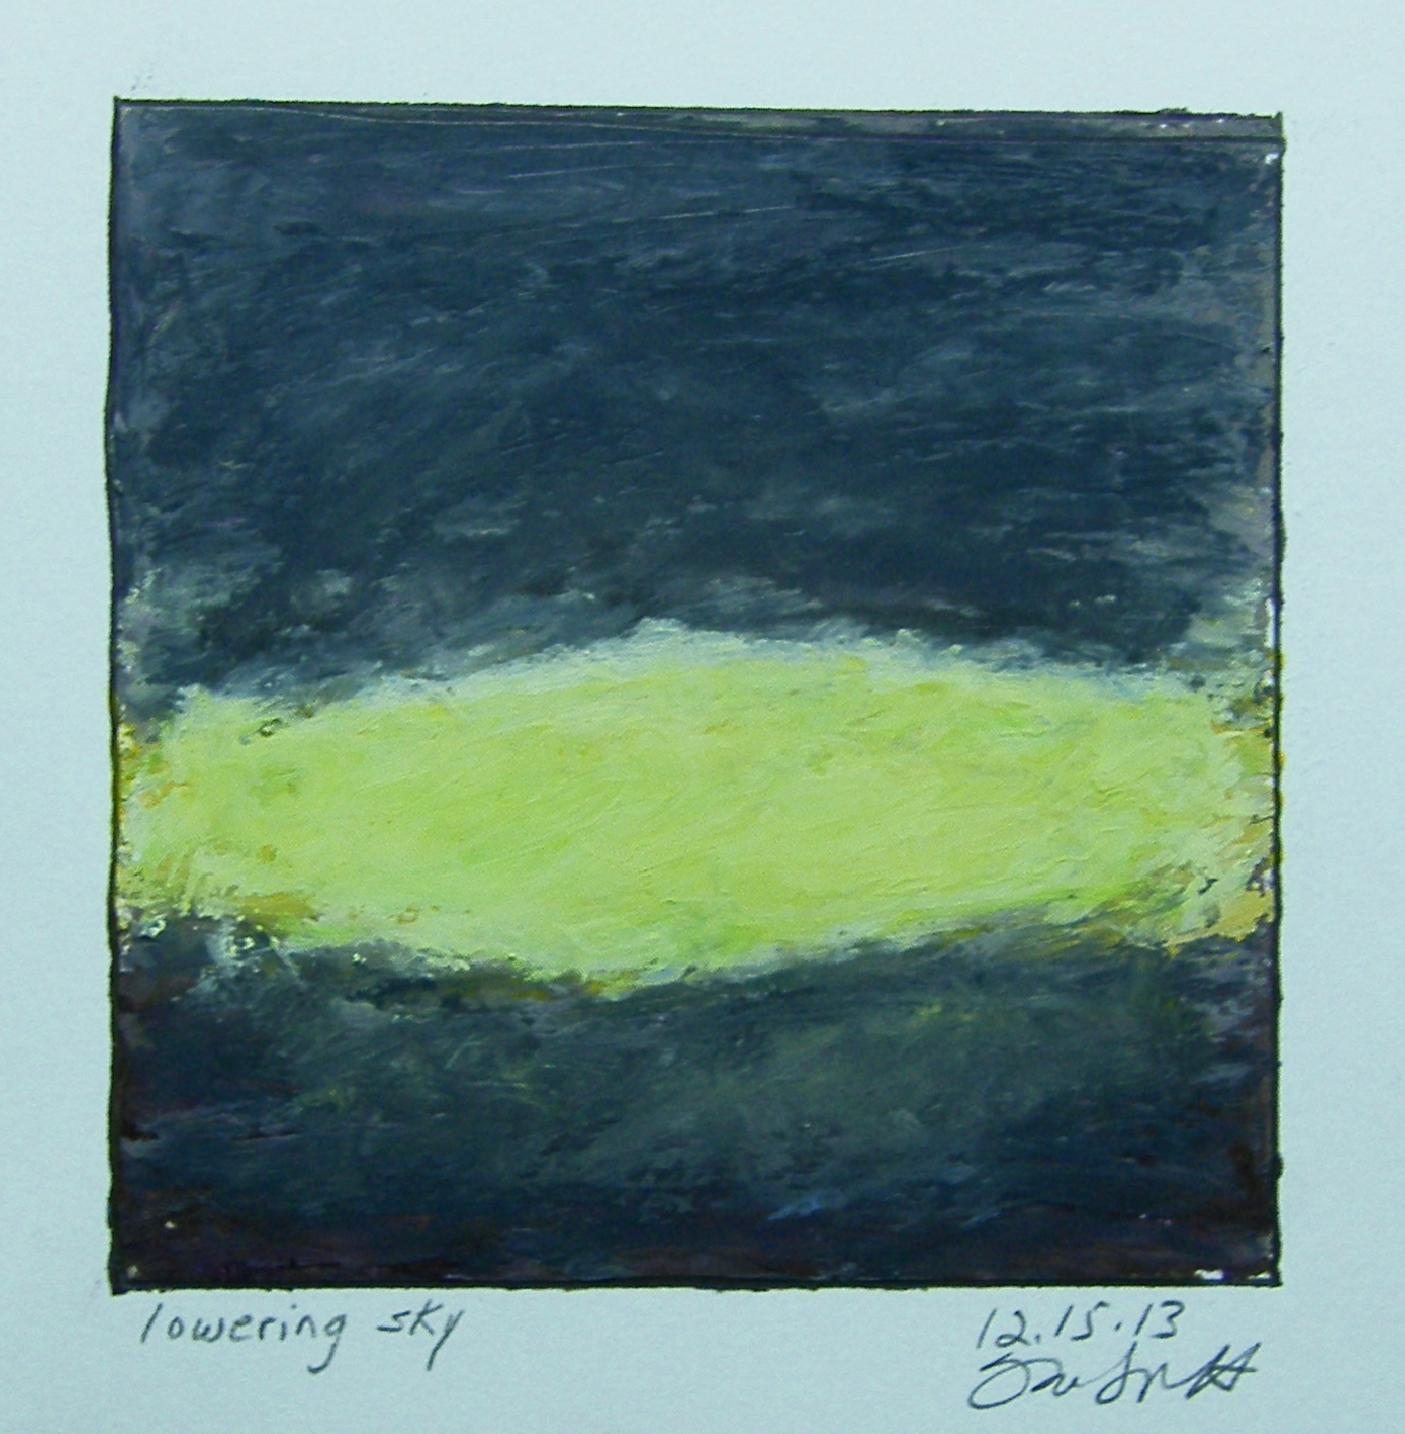 12.15.13 lowering sky